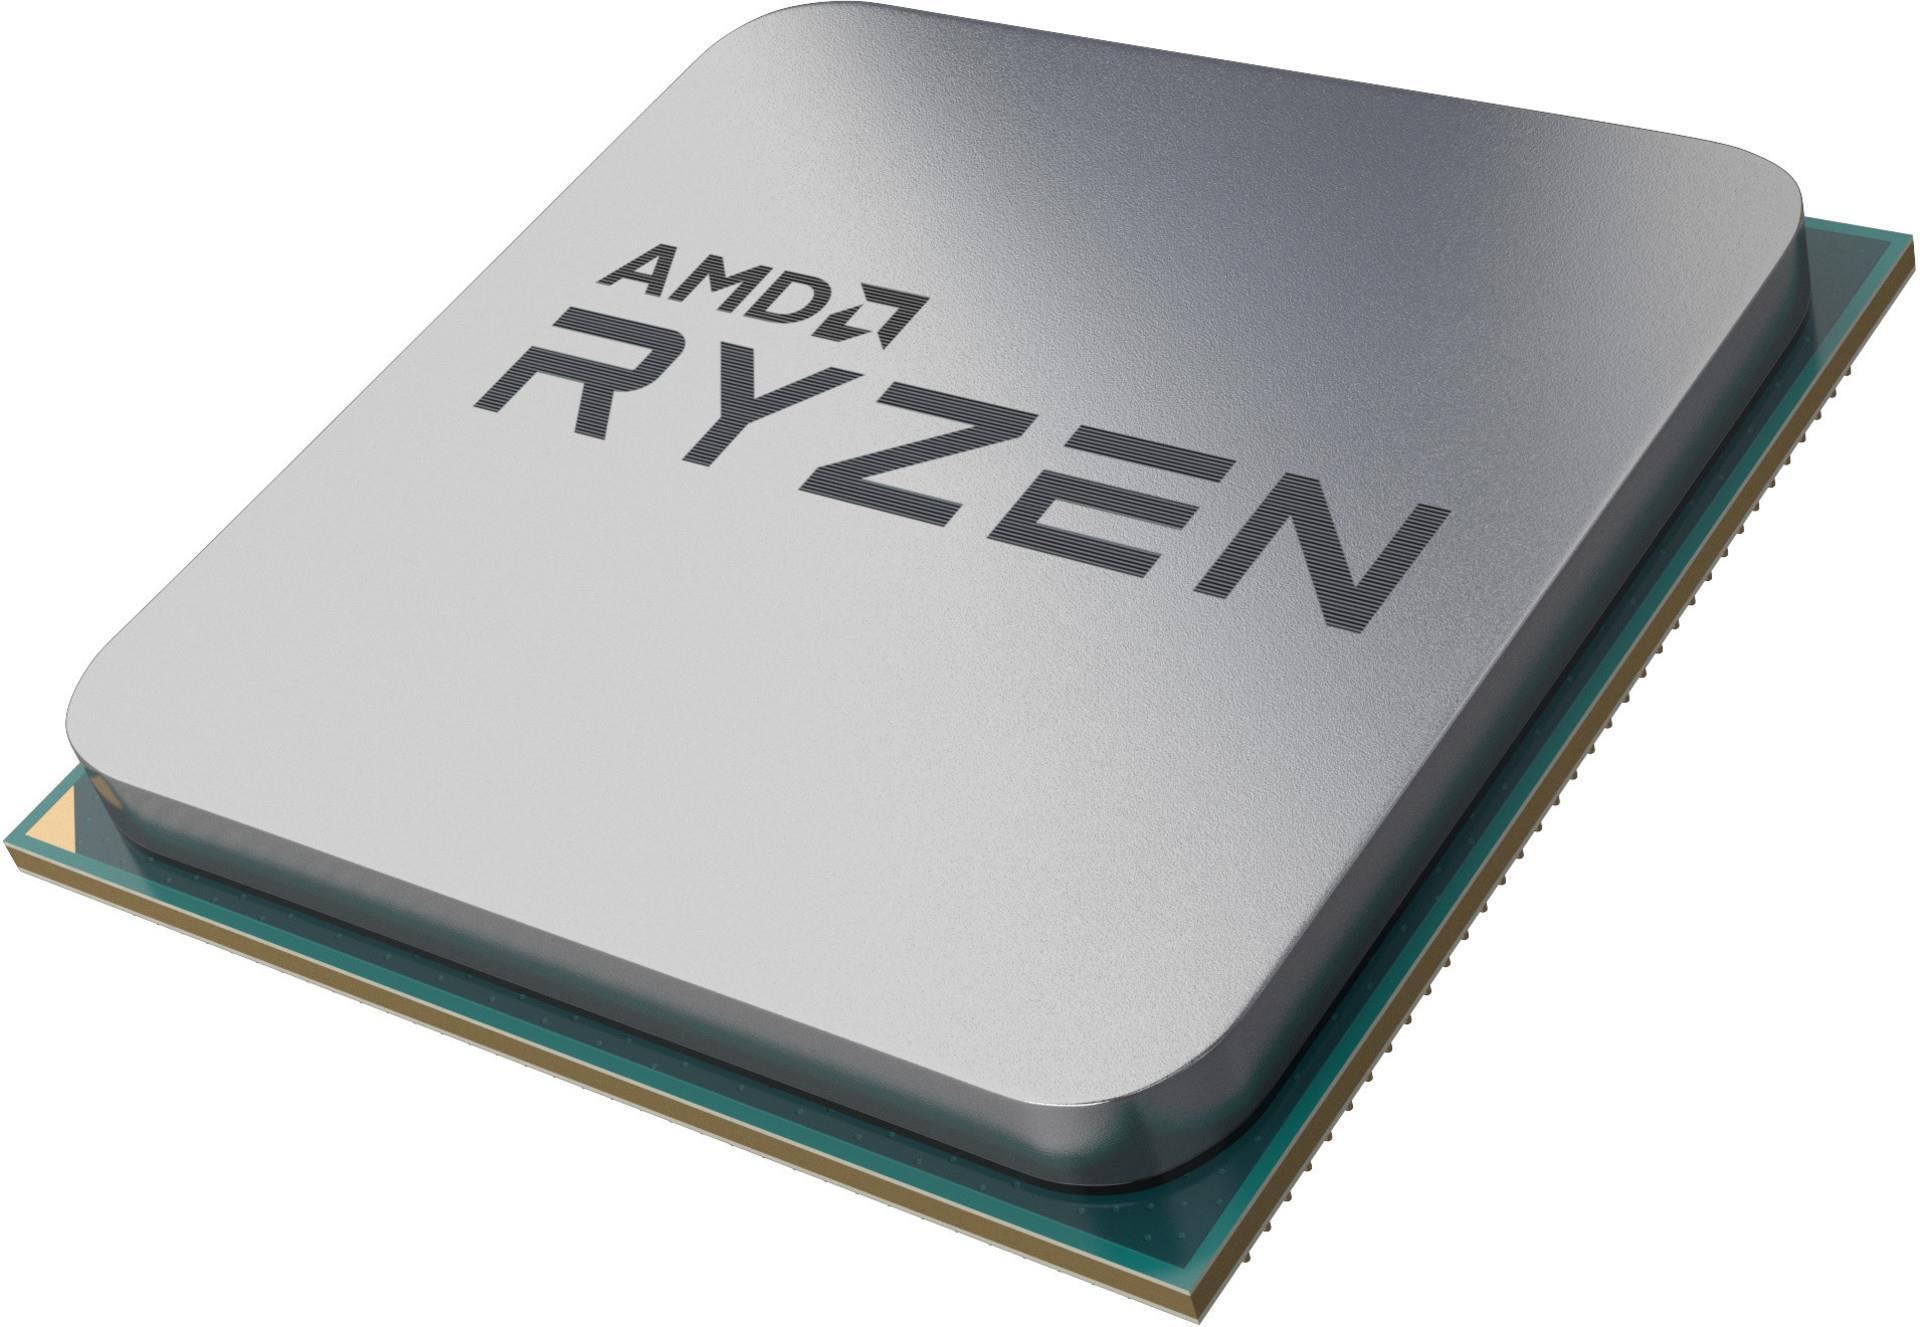 AMD Ryzen 7 2700 (3.2GHz) Processor 8 Core 16MB L3 Cache (Pack of 12)